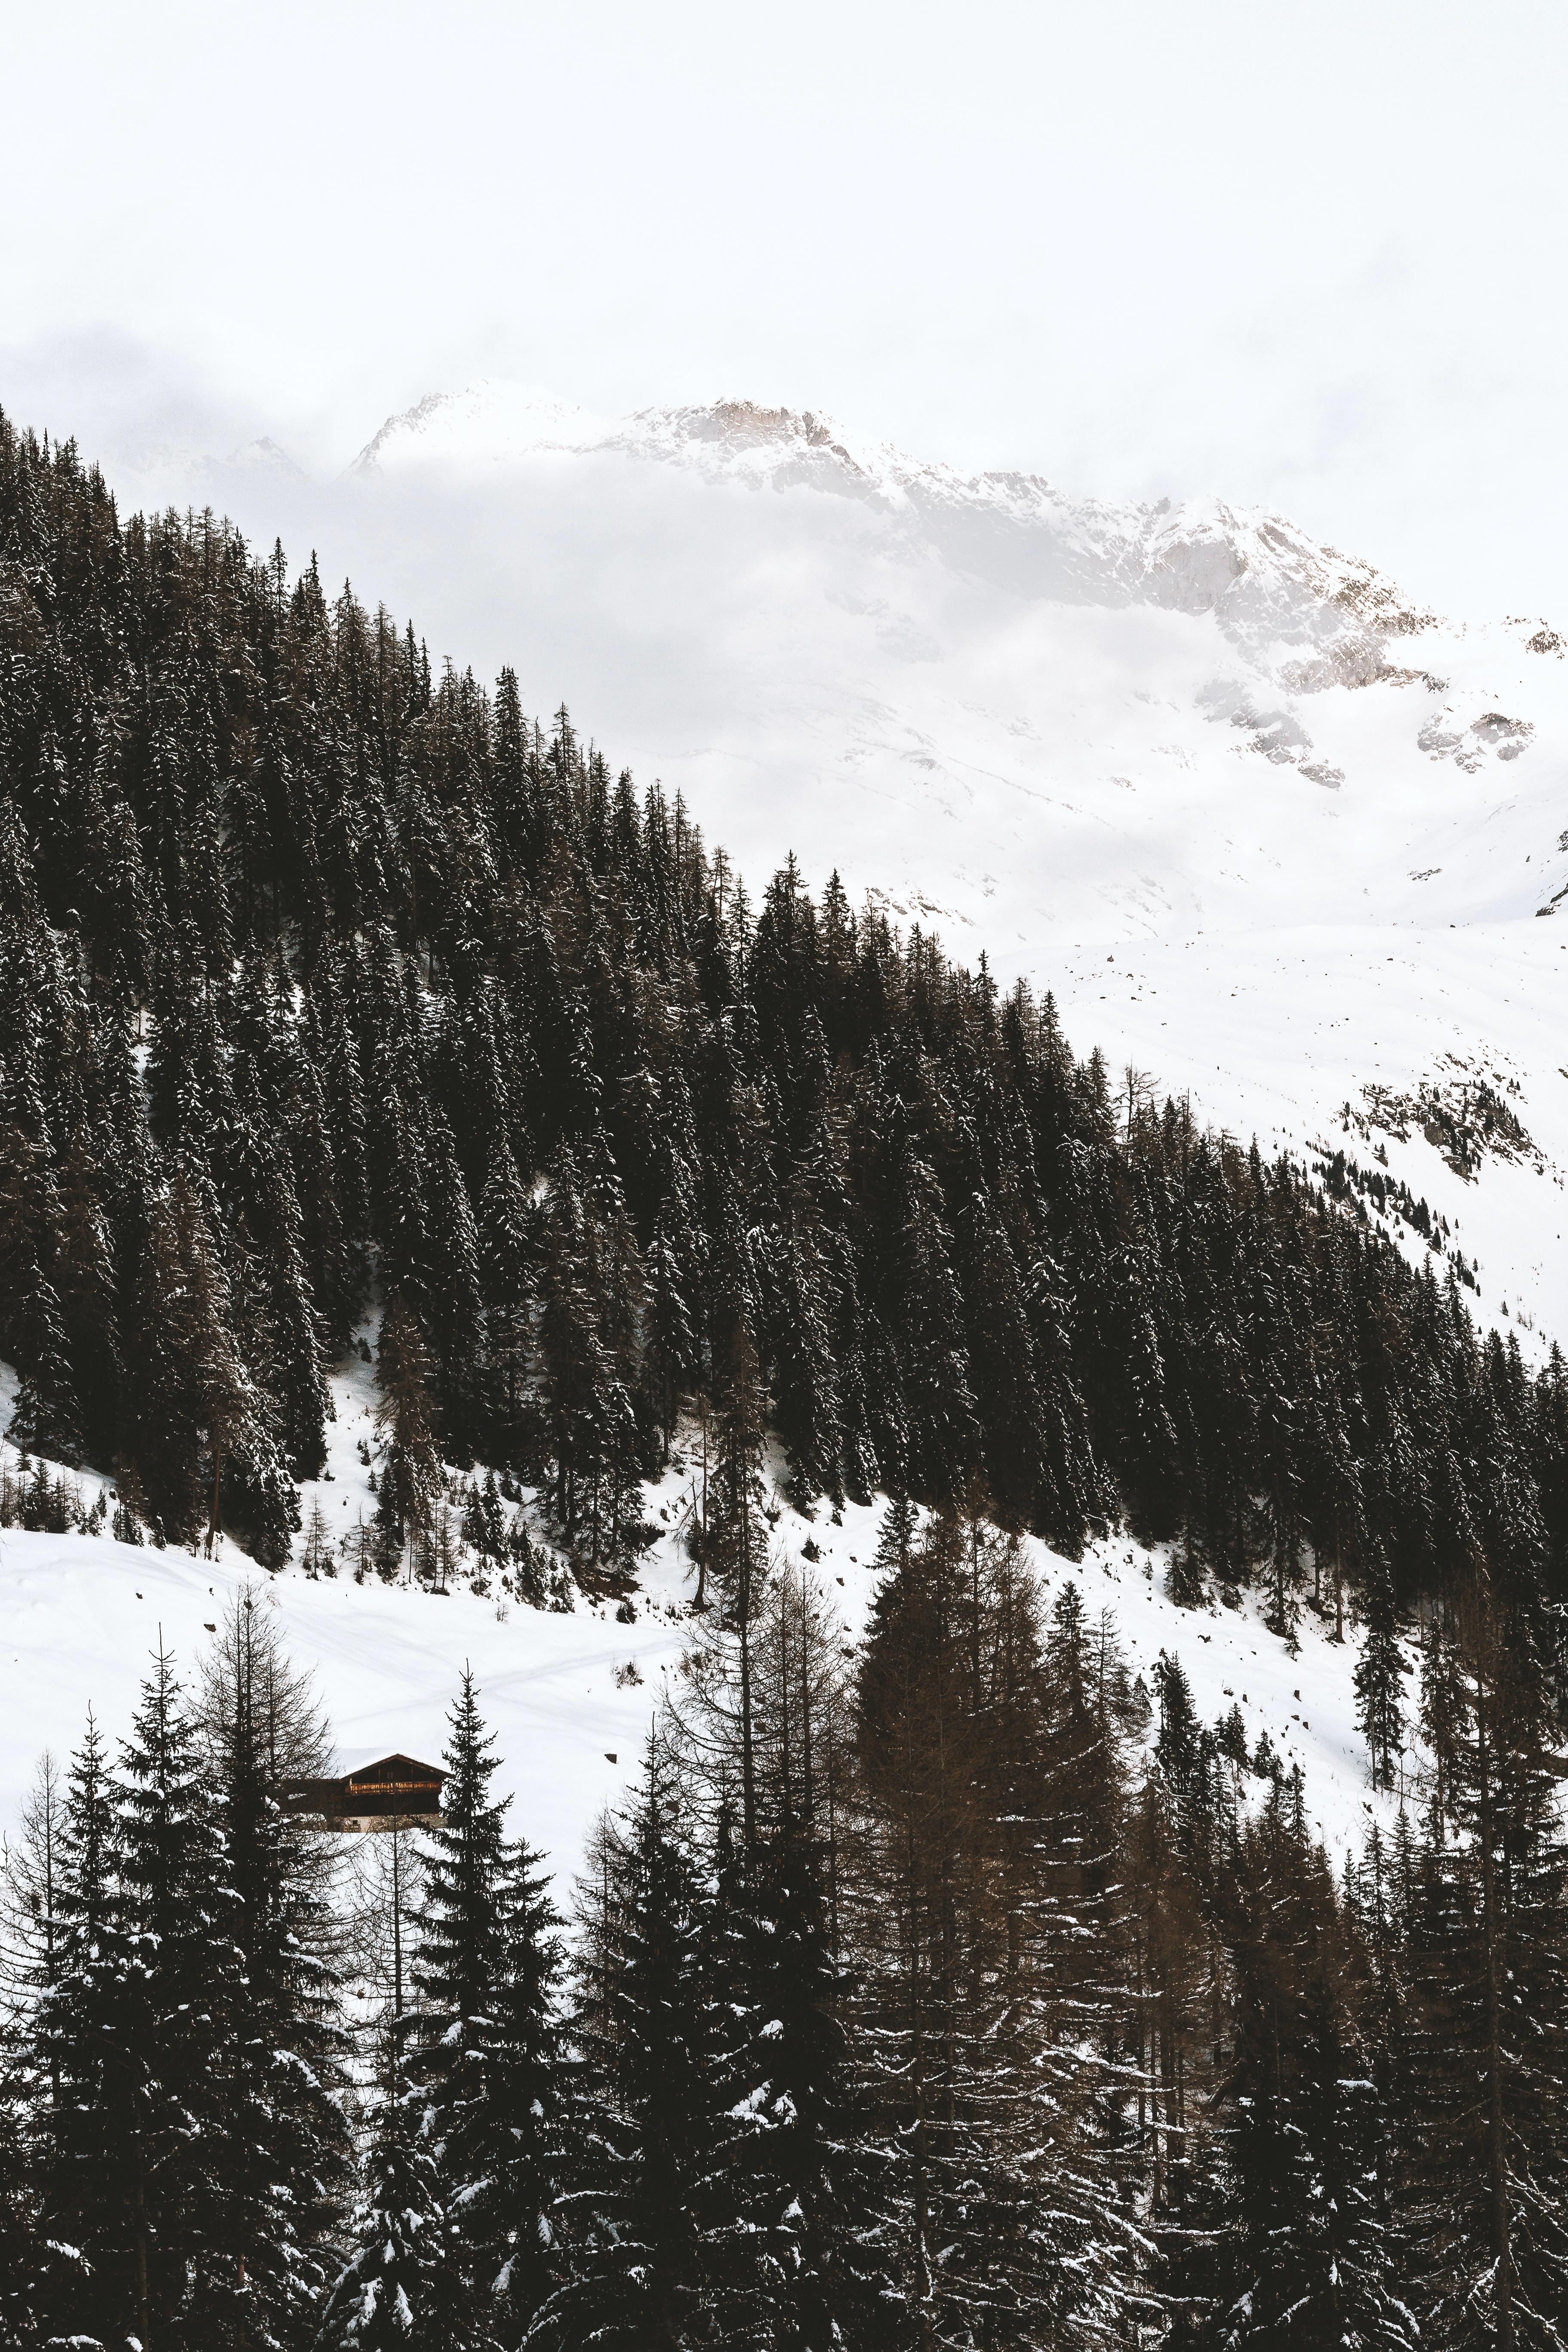 trees on snow field